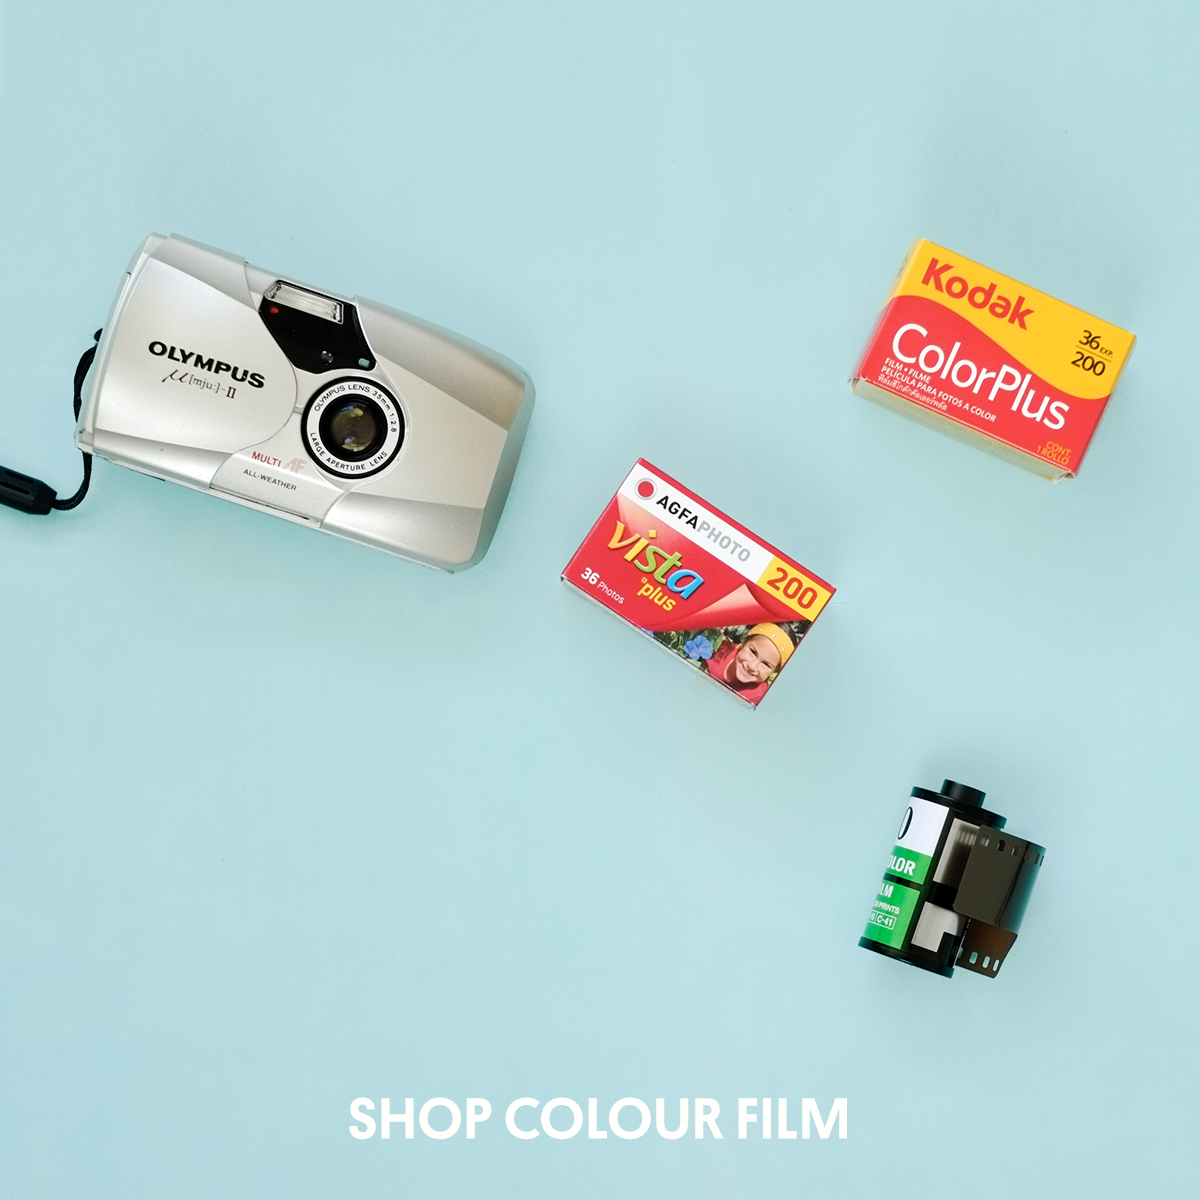 Shop Colour Film at Parallax Photographic Coop